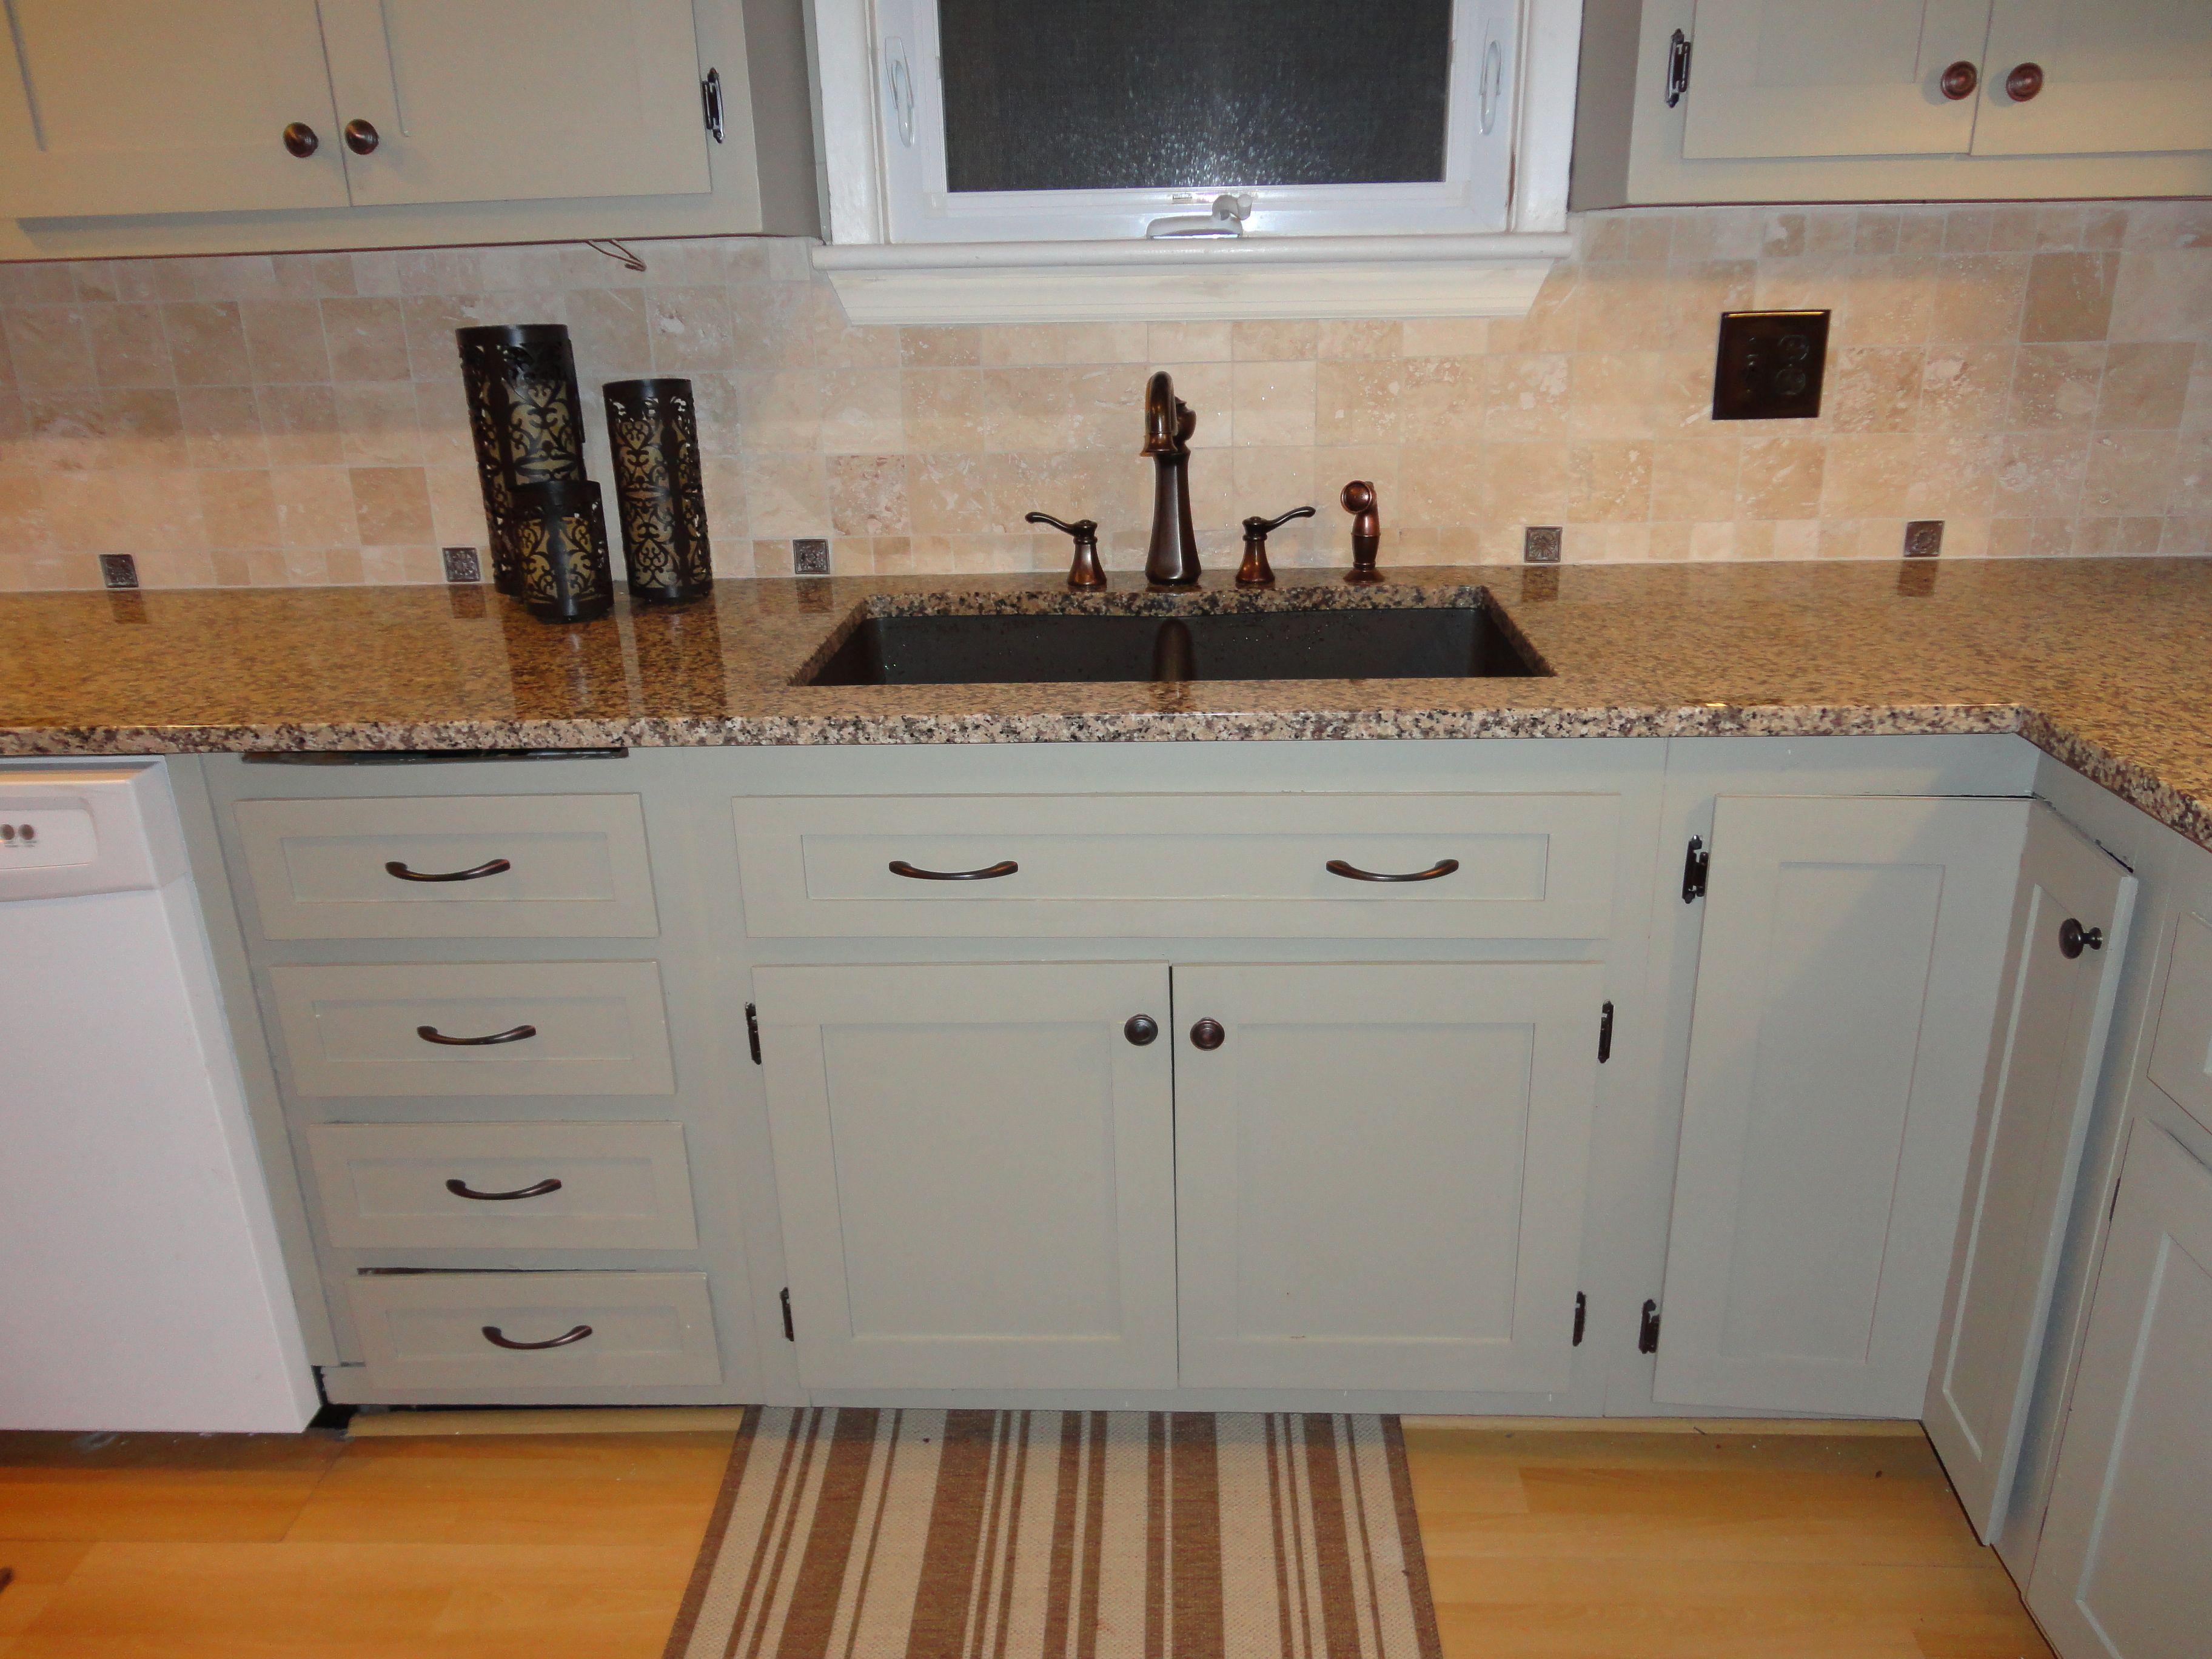 cabinets kitchen stewart martha entity decorating above simple